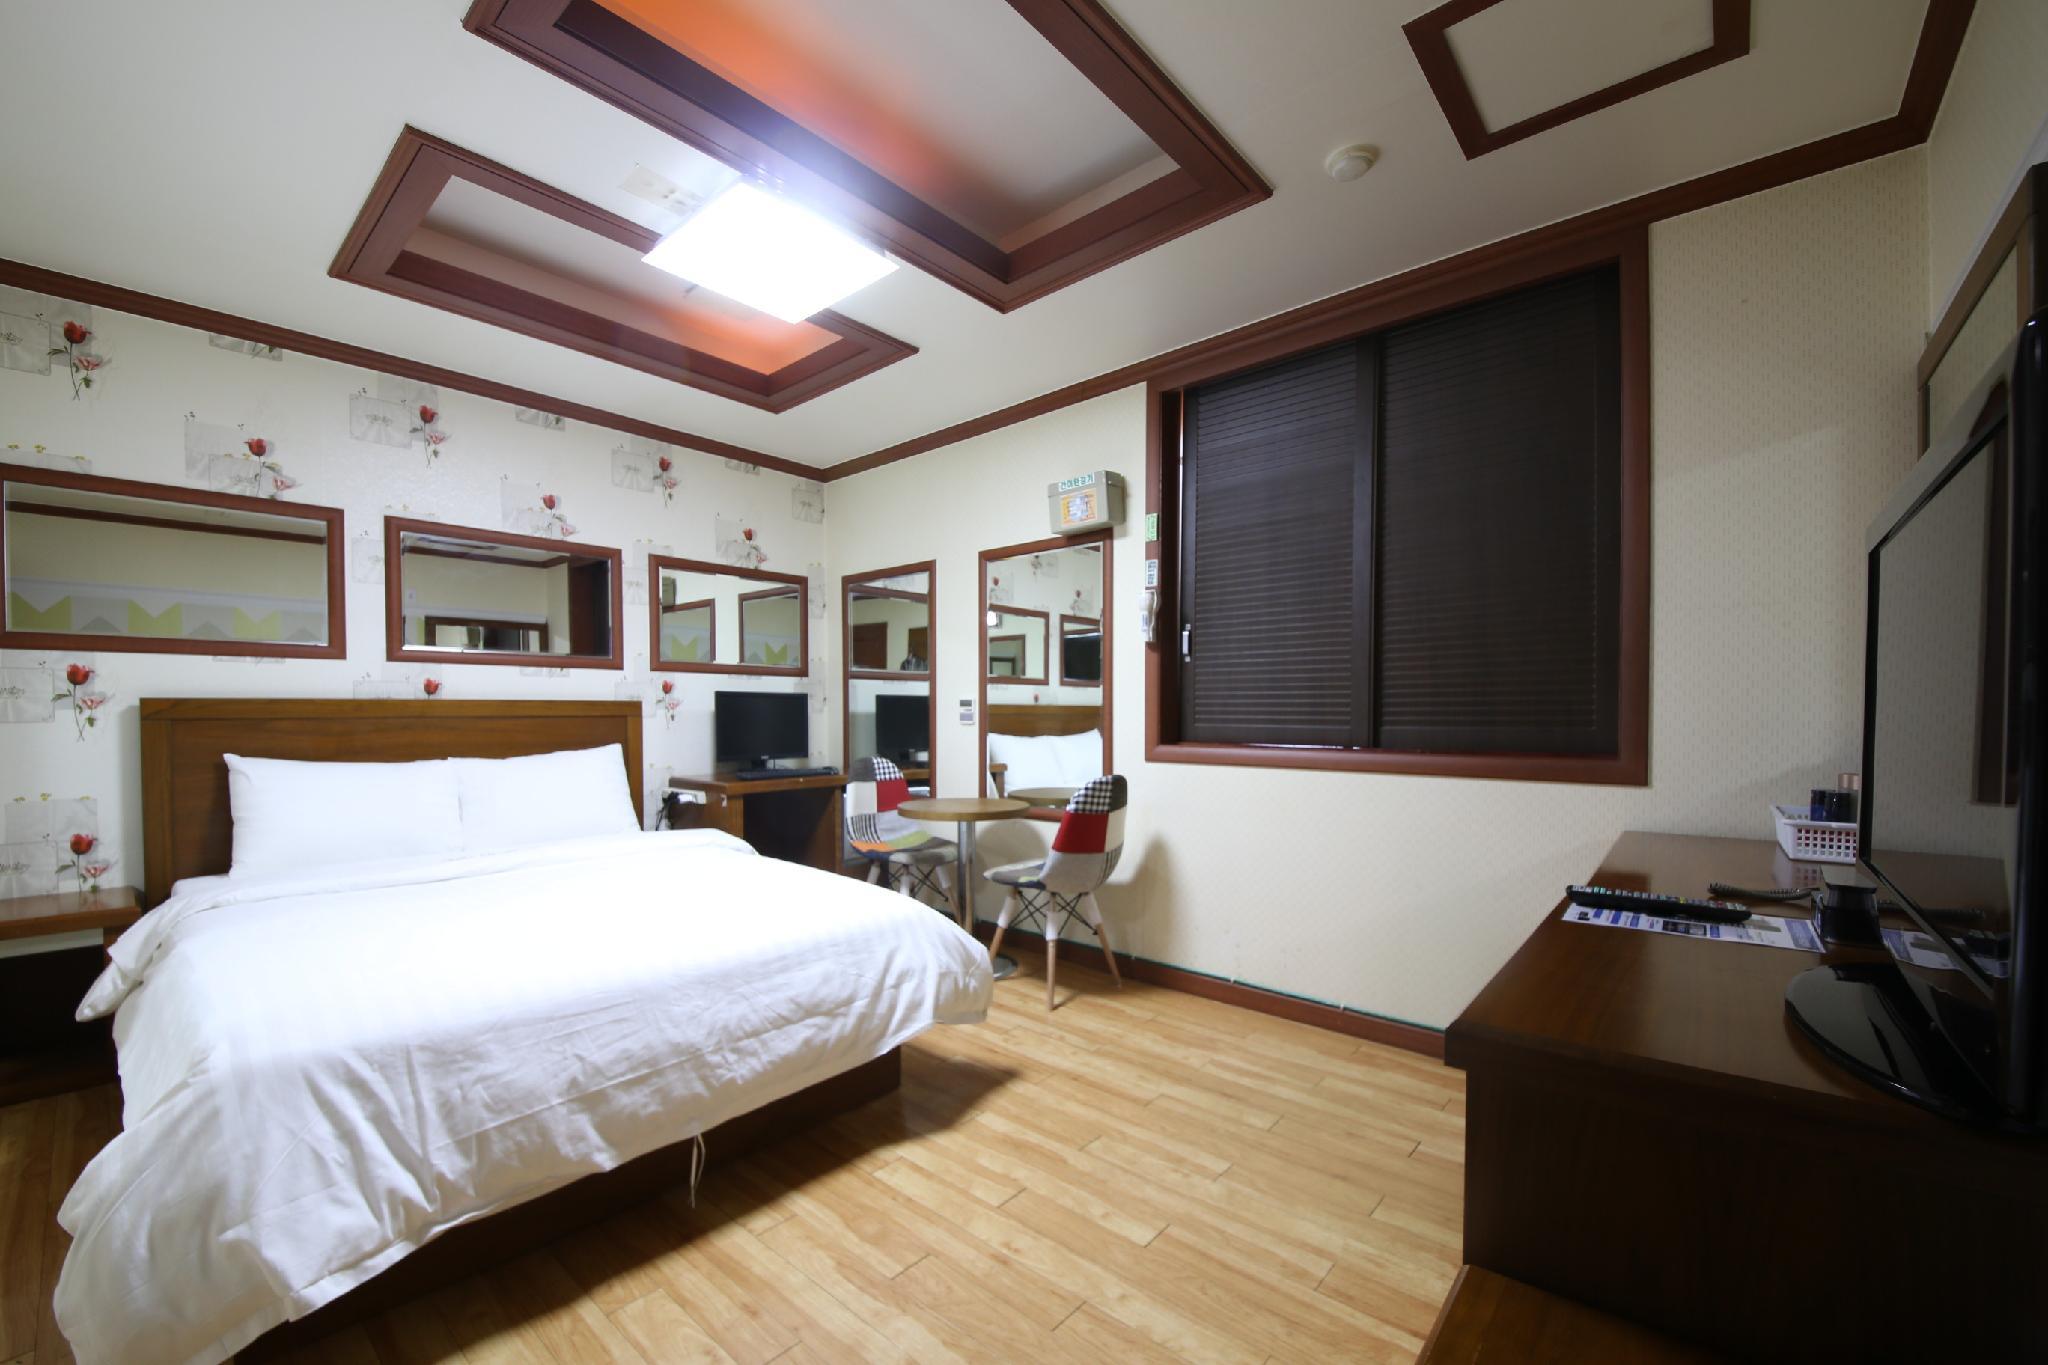 Taeung Tourist Hotel Daejeon South Korea